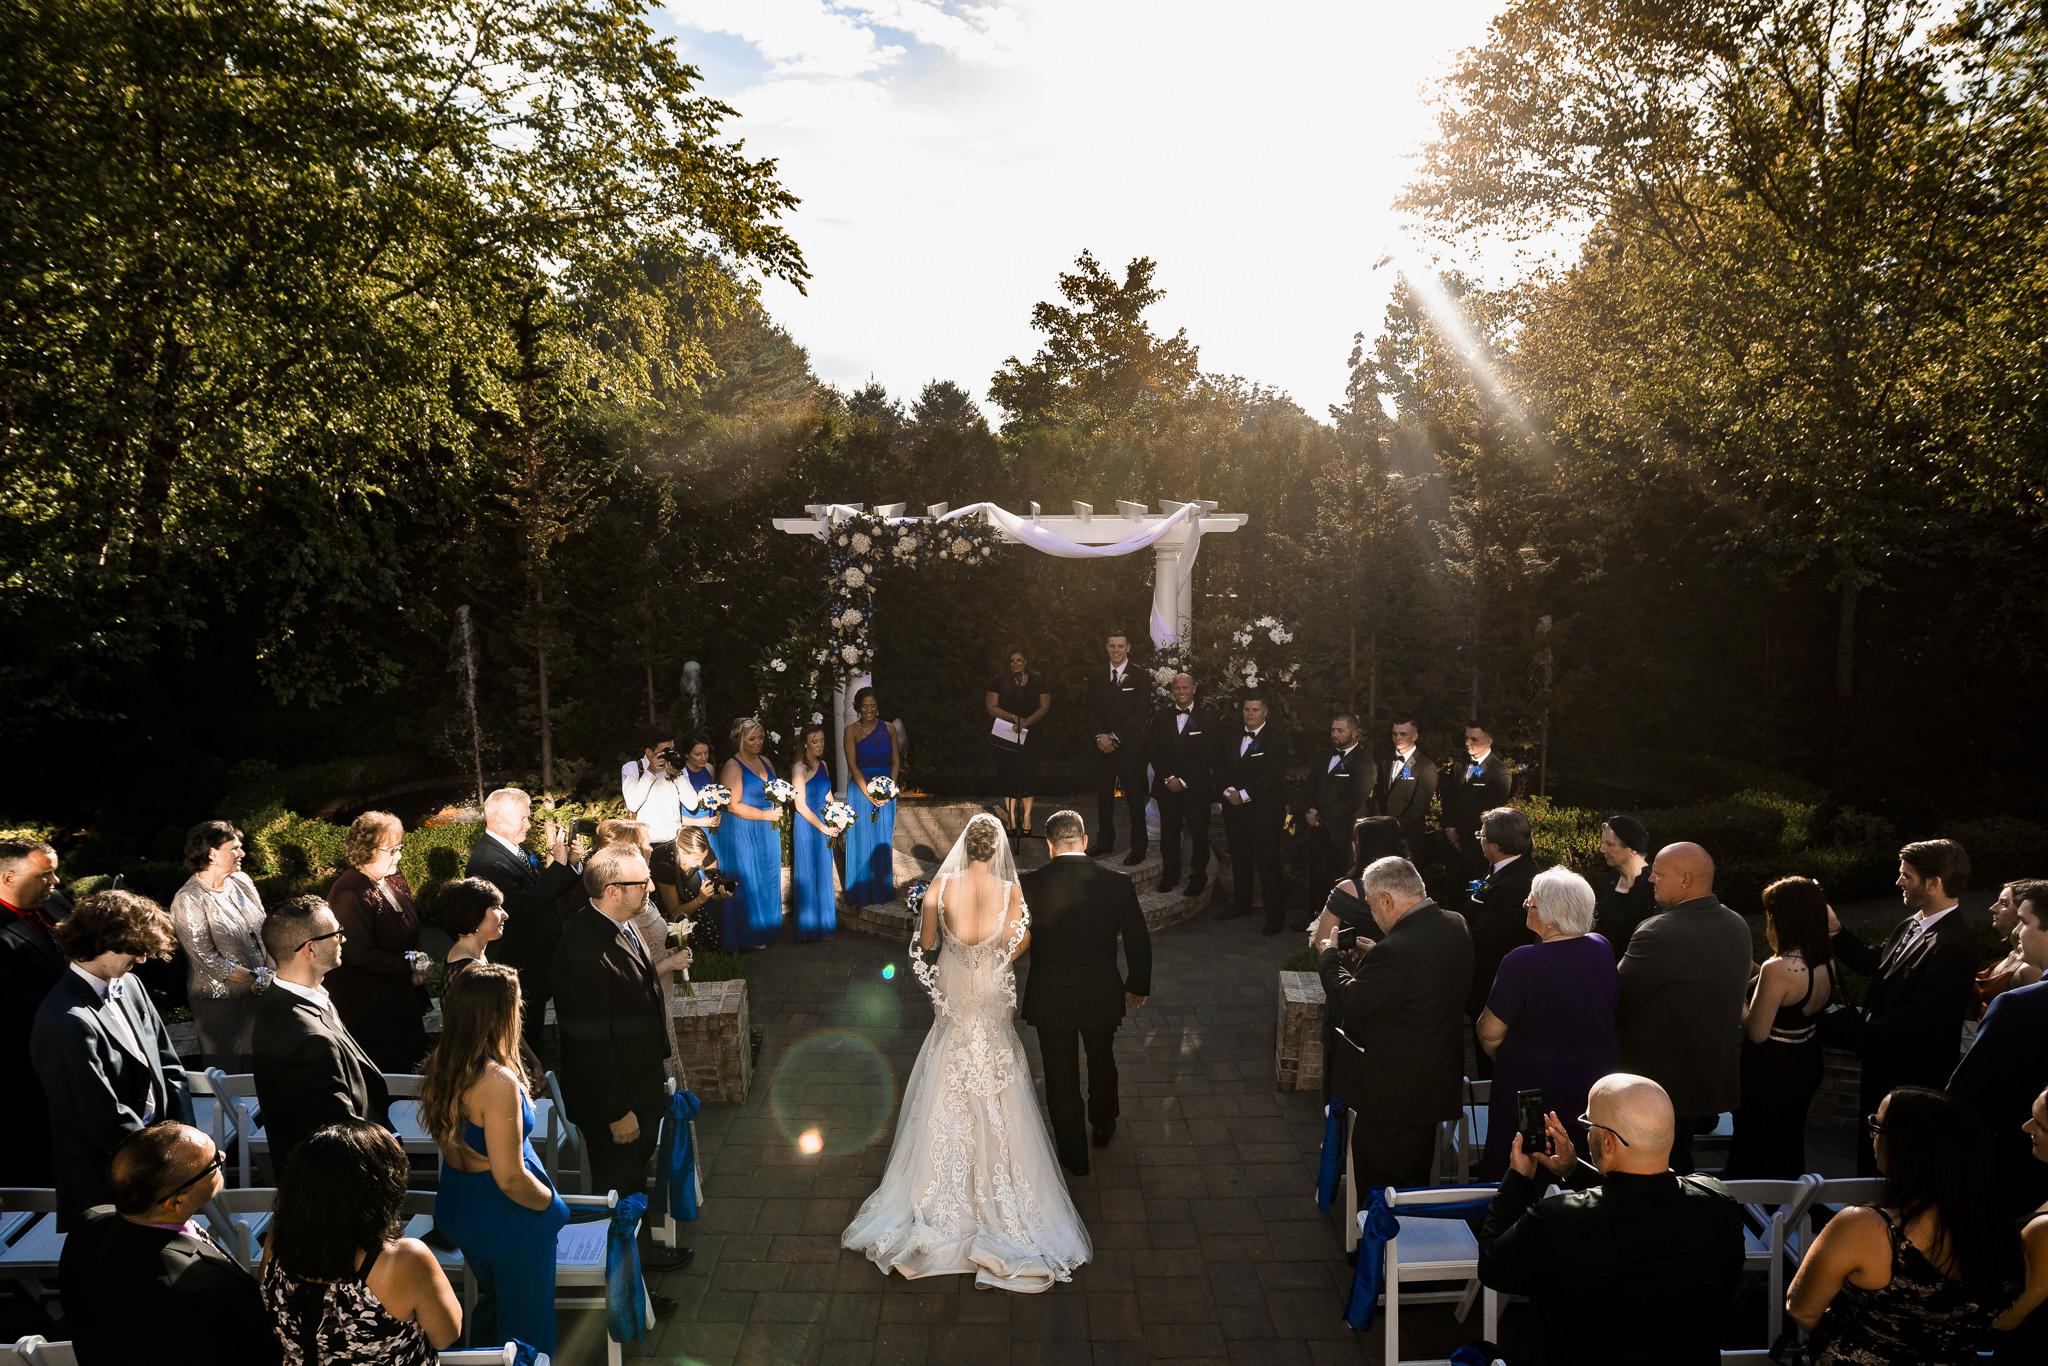 Brennan-South-Gate-Manor-New-Jersey-Wedding-Photographer-22.JPG